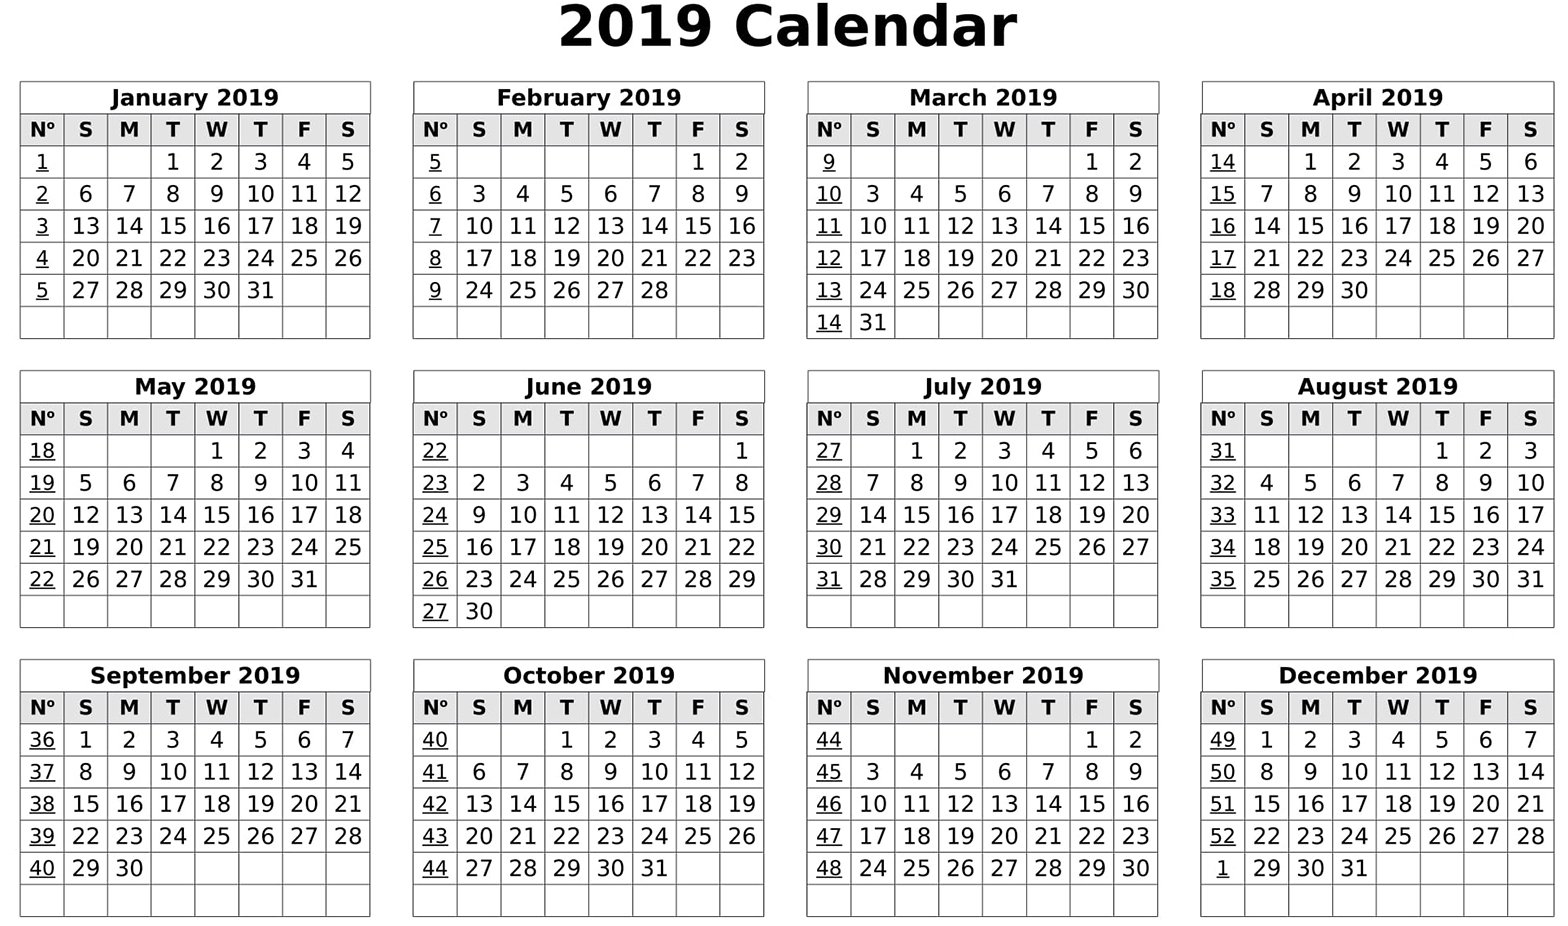 Calendar 2019 Print Out   Free Printable 2018 Calendar Template Word Calendar 2019 Excel By Week